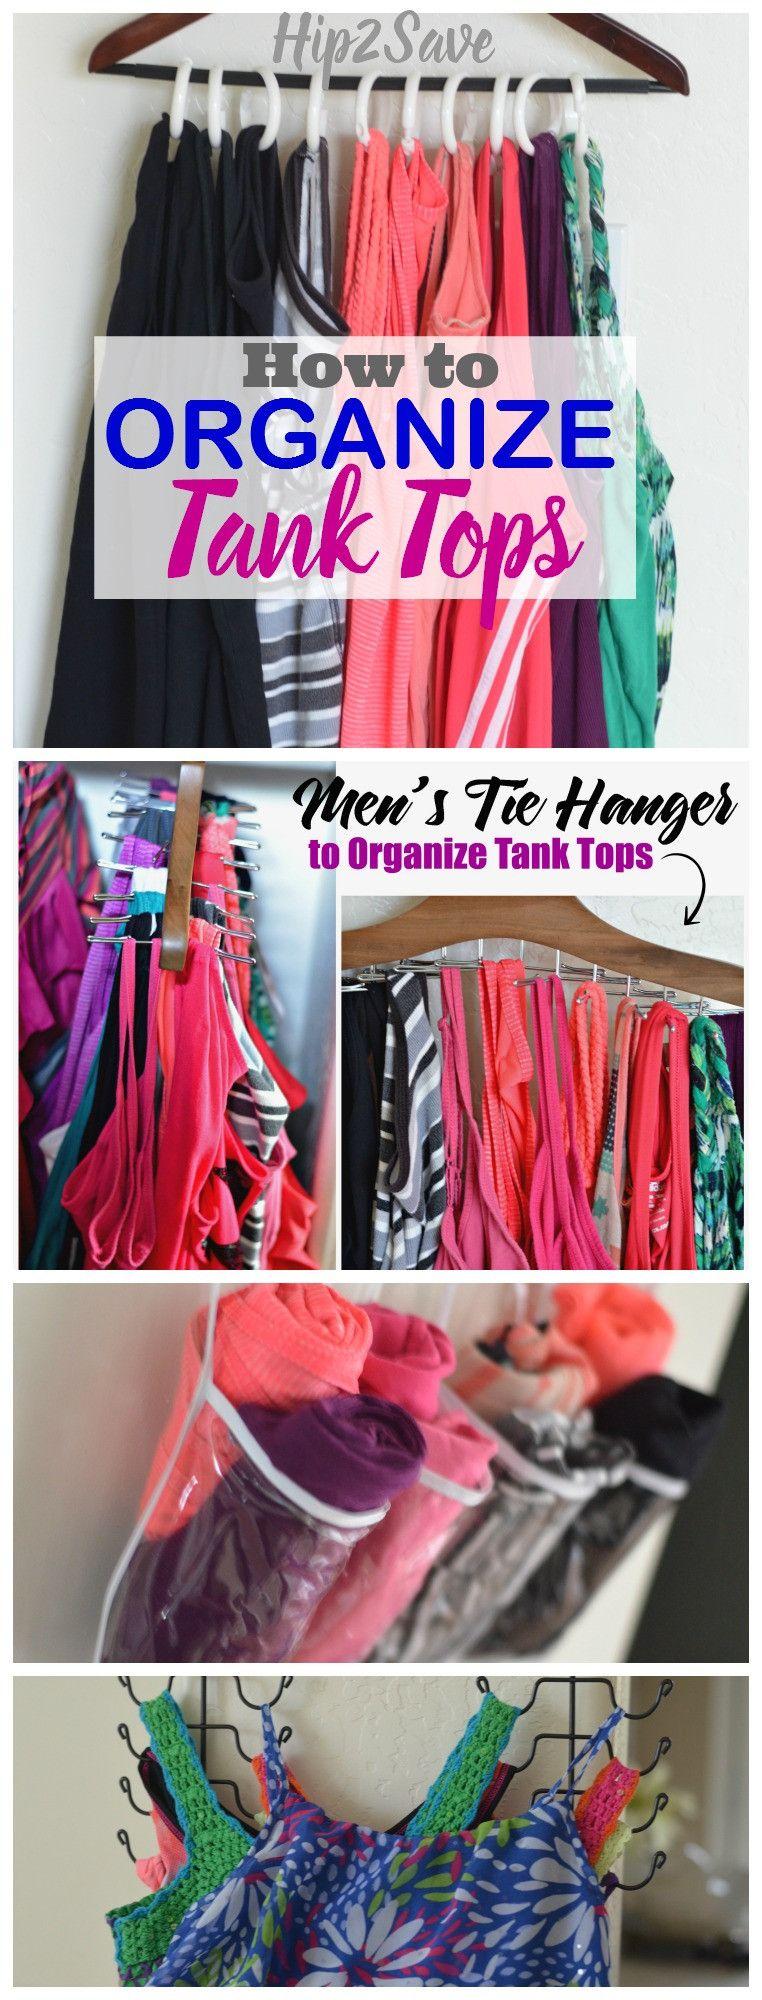 4 Easy Ways to Organize Tank Tops -   12 DIY Clothes Storage how to organize ideas